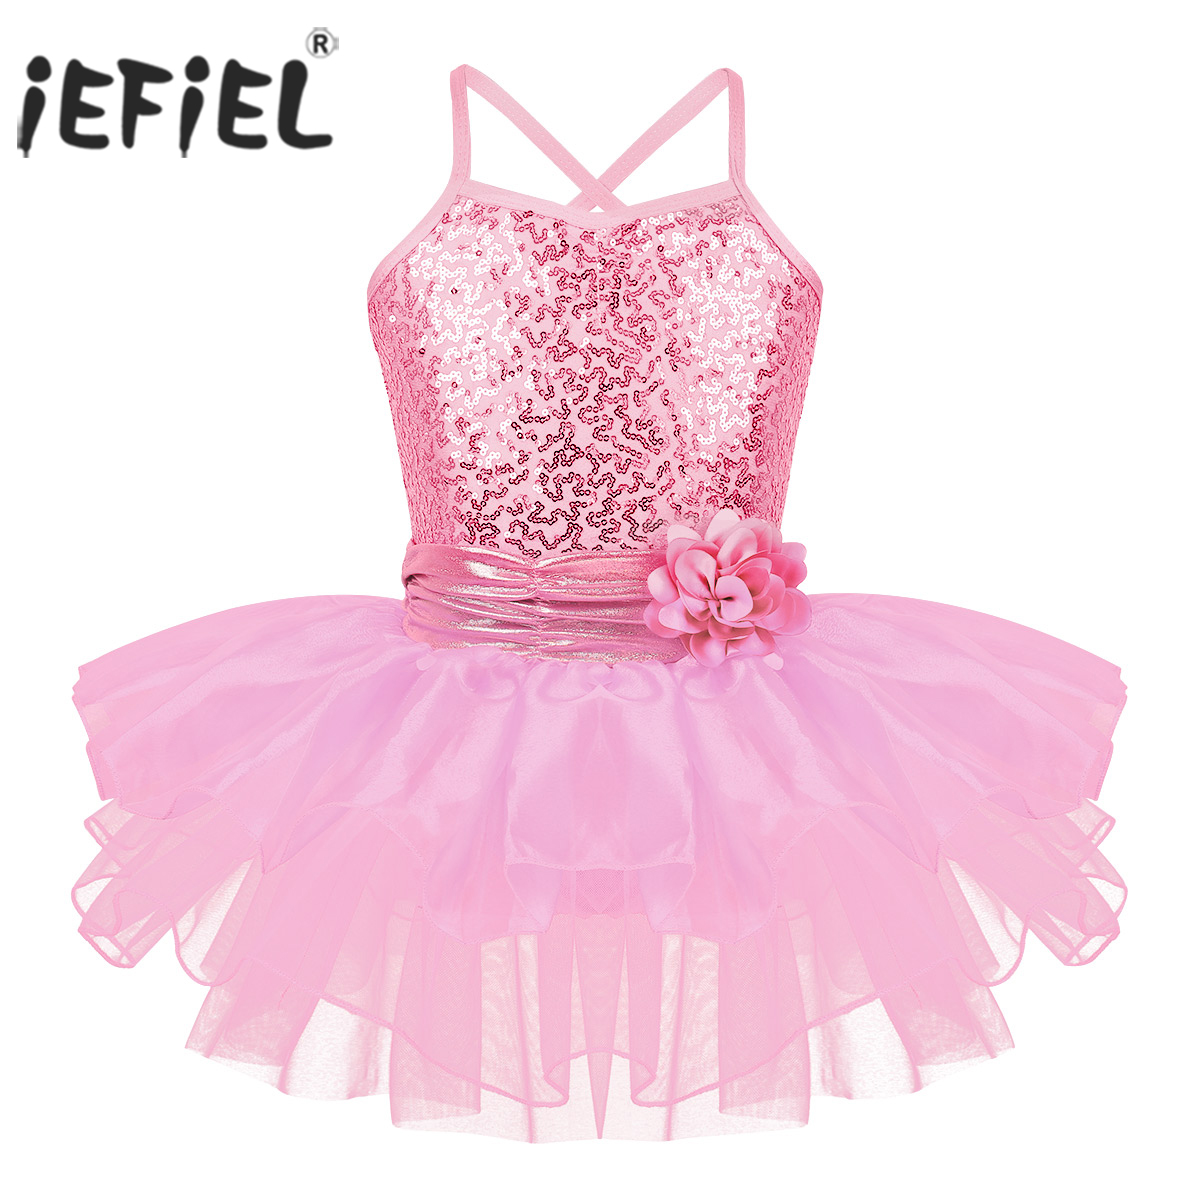 Kids Girls Ballet Leotard Tutu Dress Party Dance Skating Ruffled Dancewear Pink